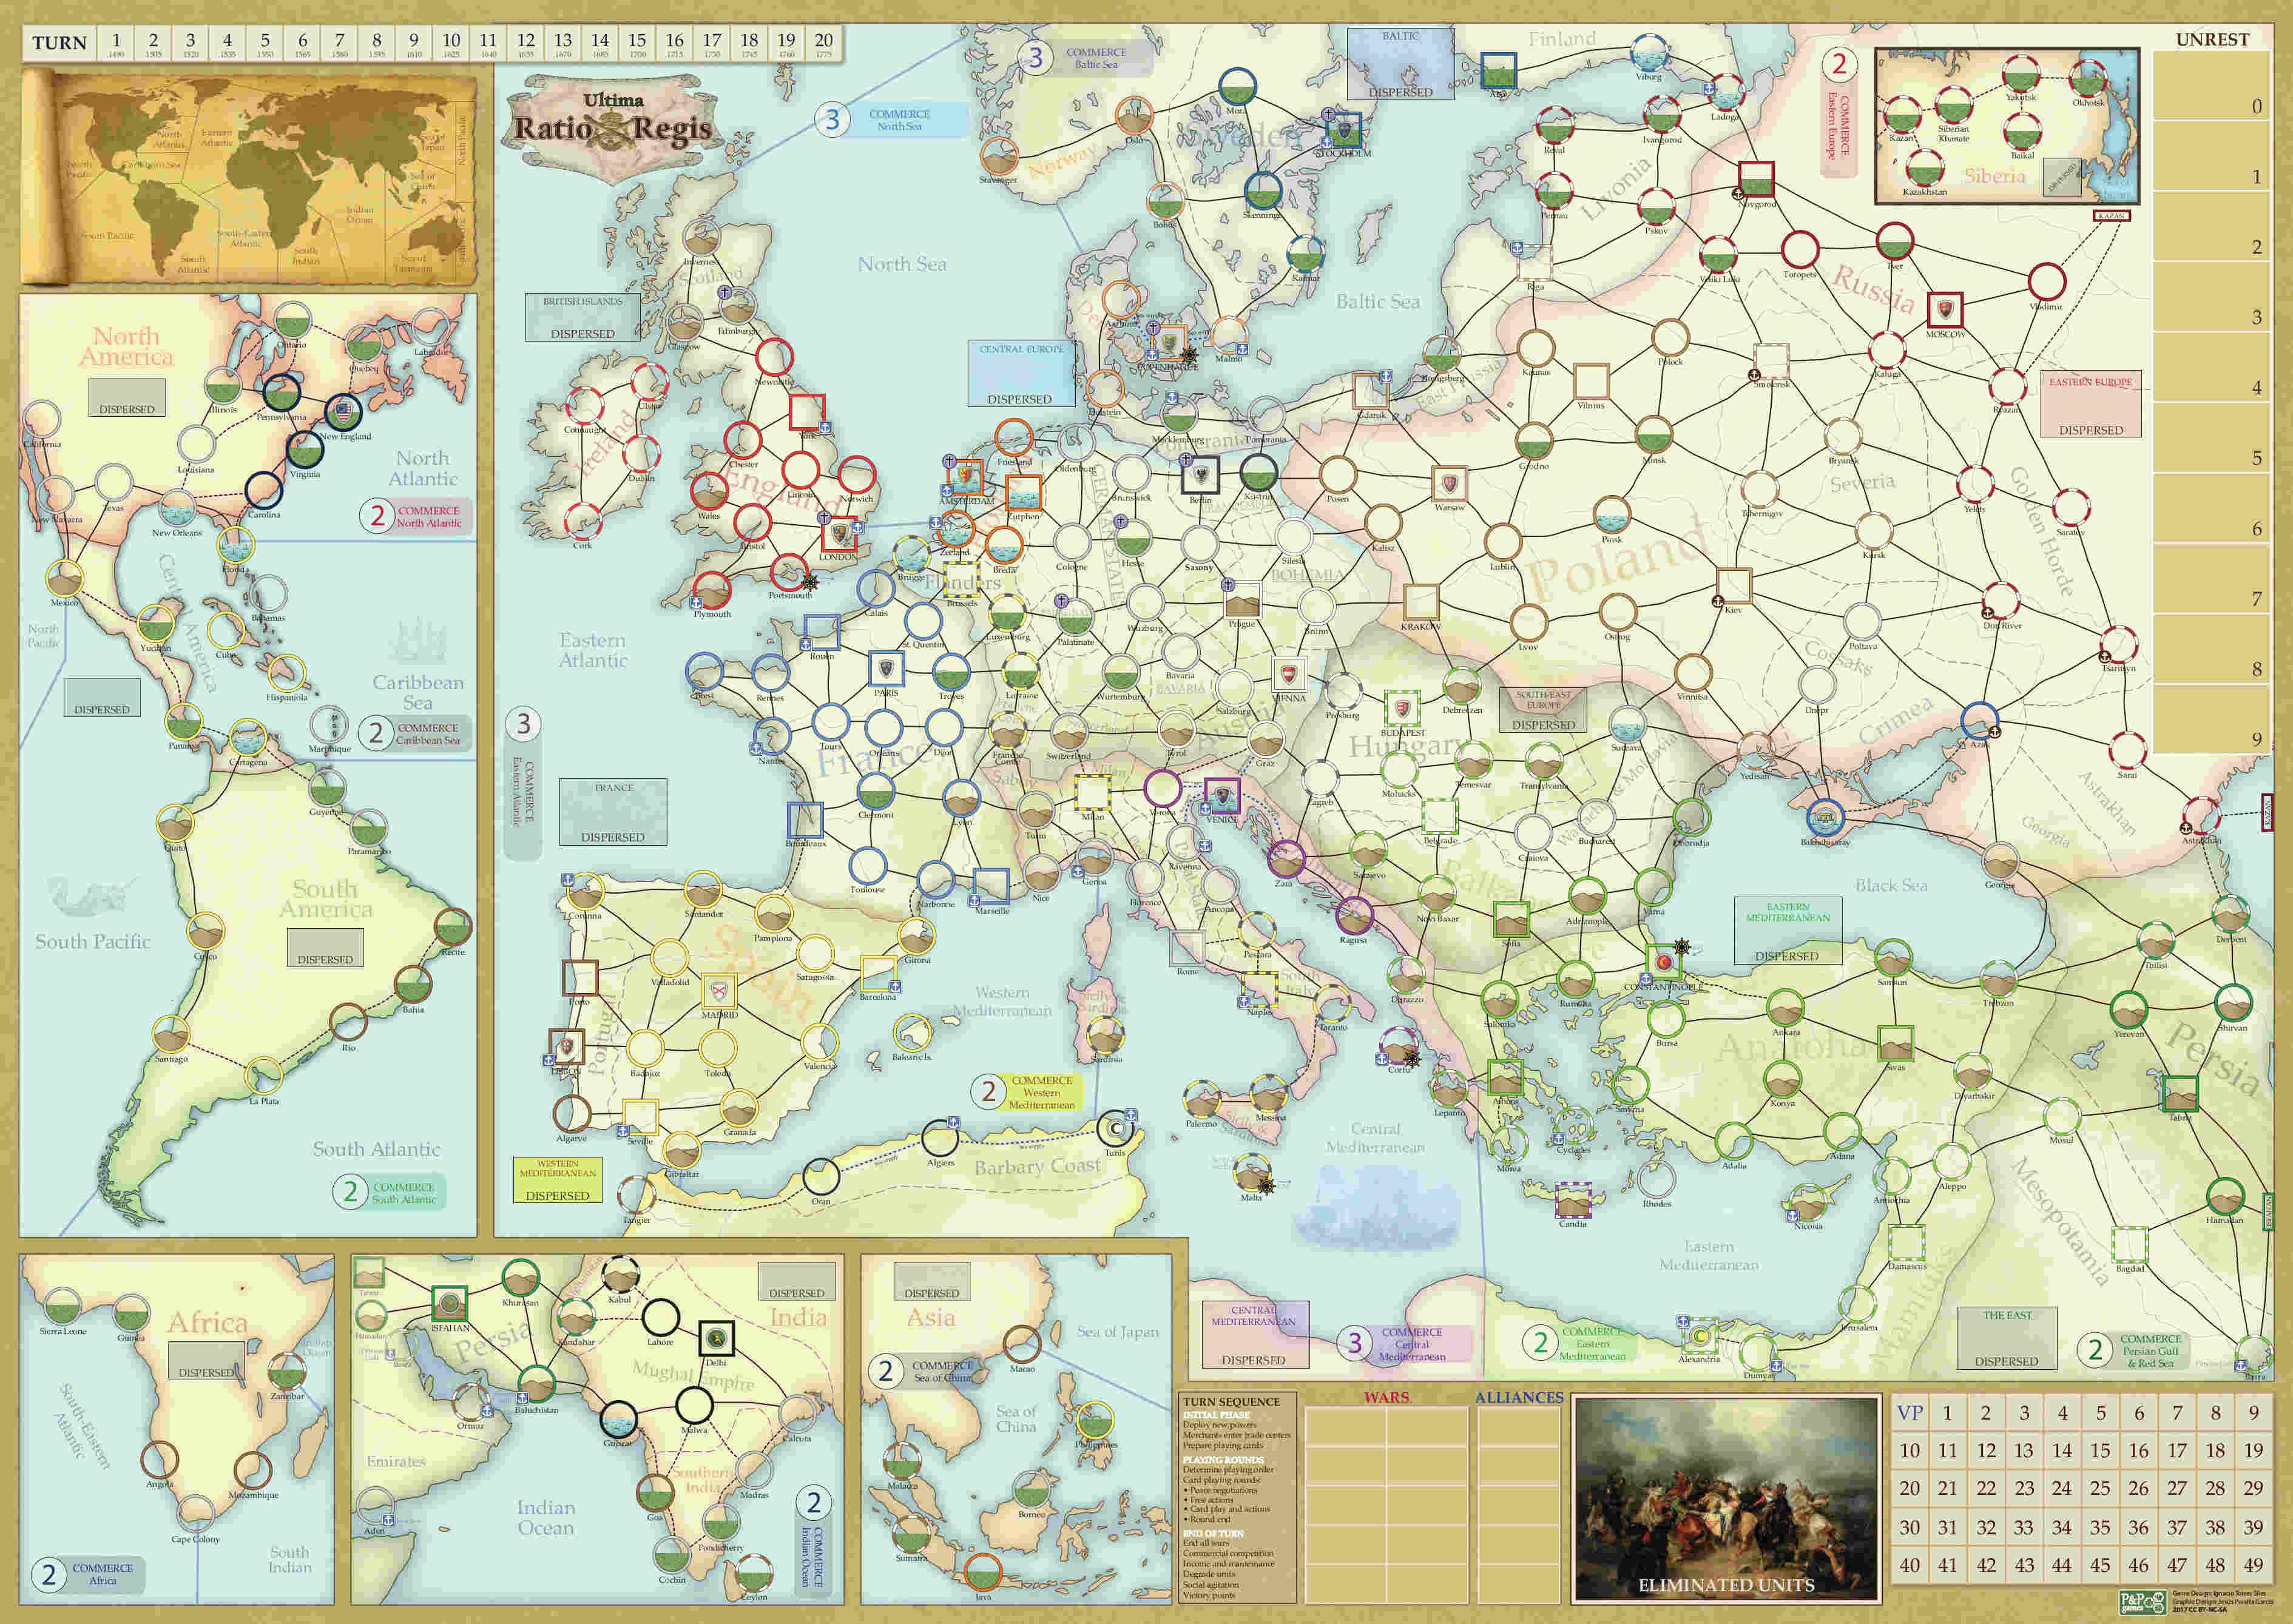 Mapa.1.2 uRR